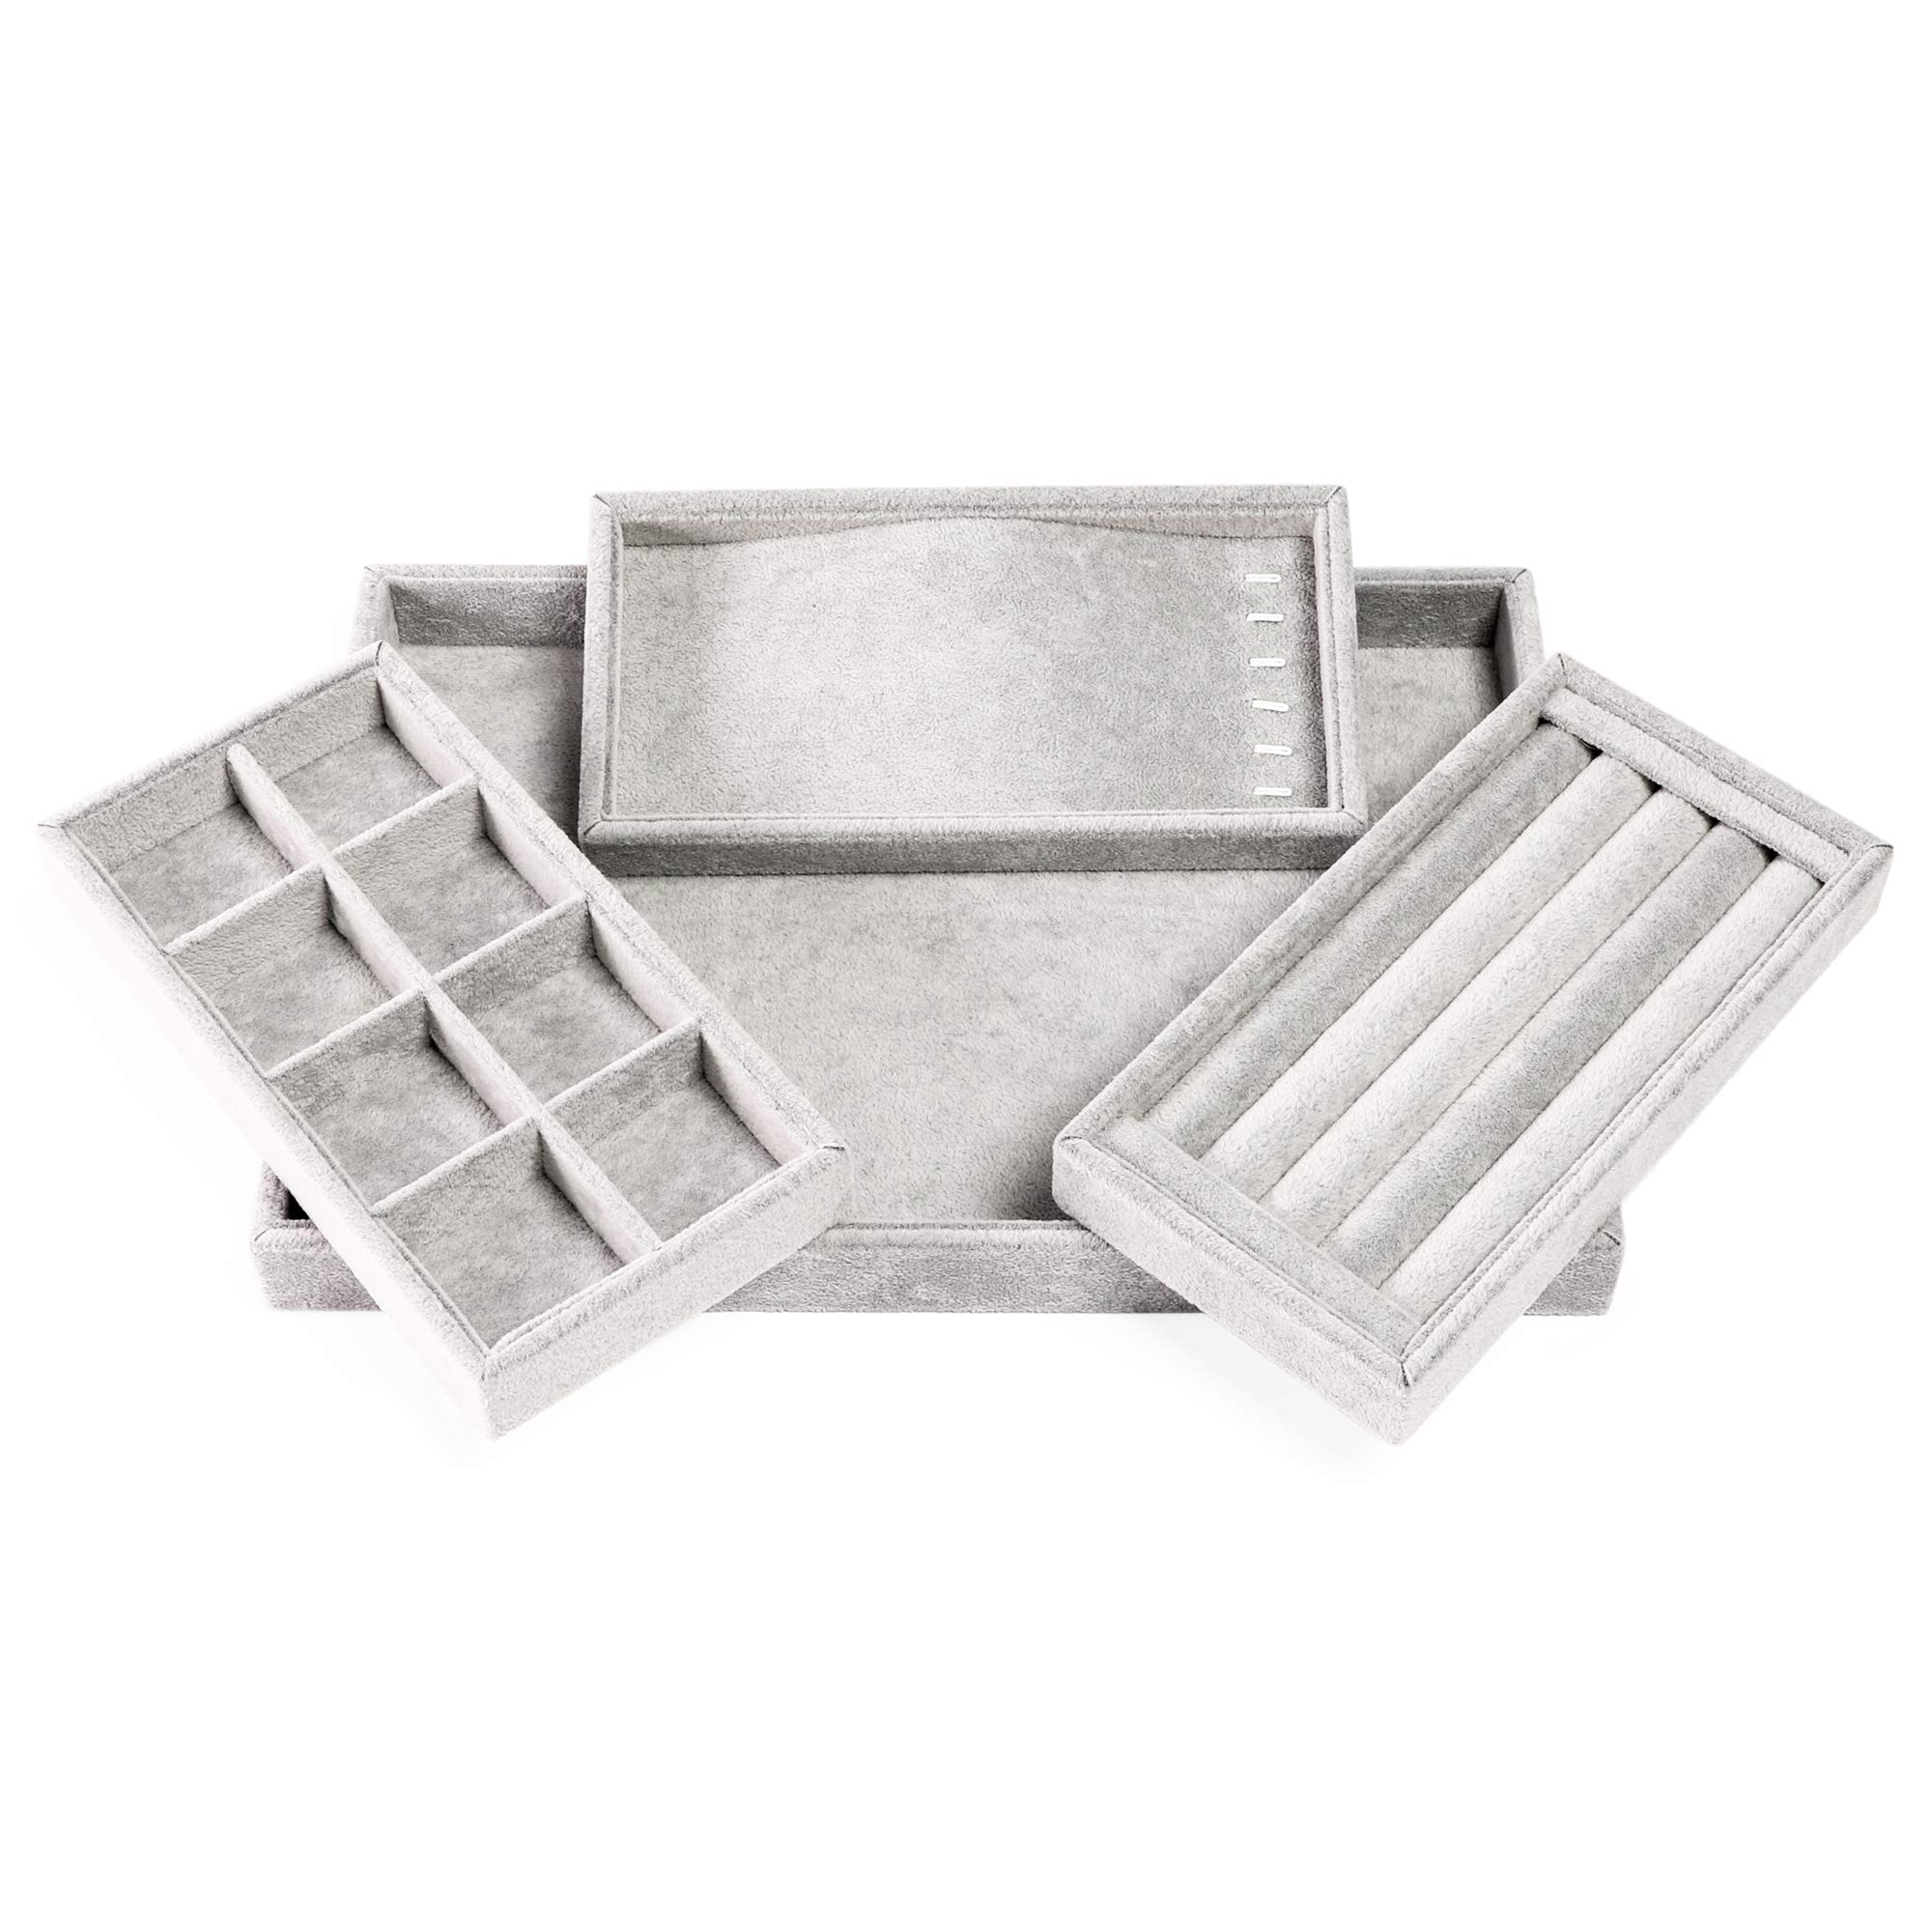 Juvale 4 合 1 可堆叠珠宝托盘抽屉收纳盒(35.56 x 24.13 厘米,灰色,天鹅绒)